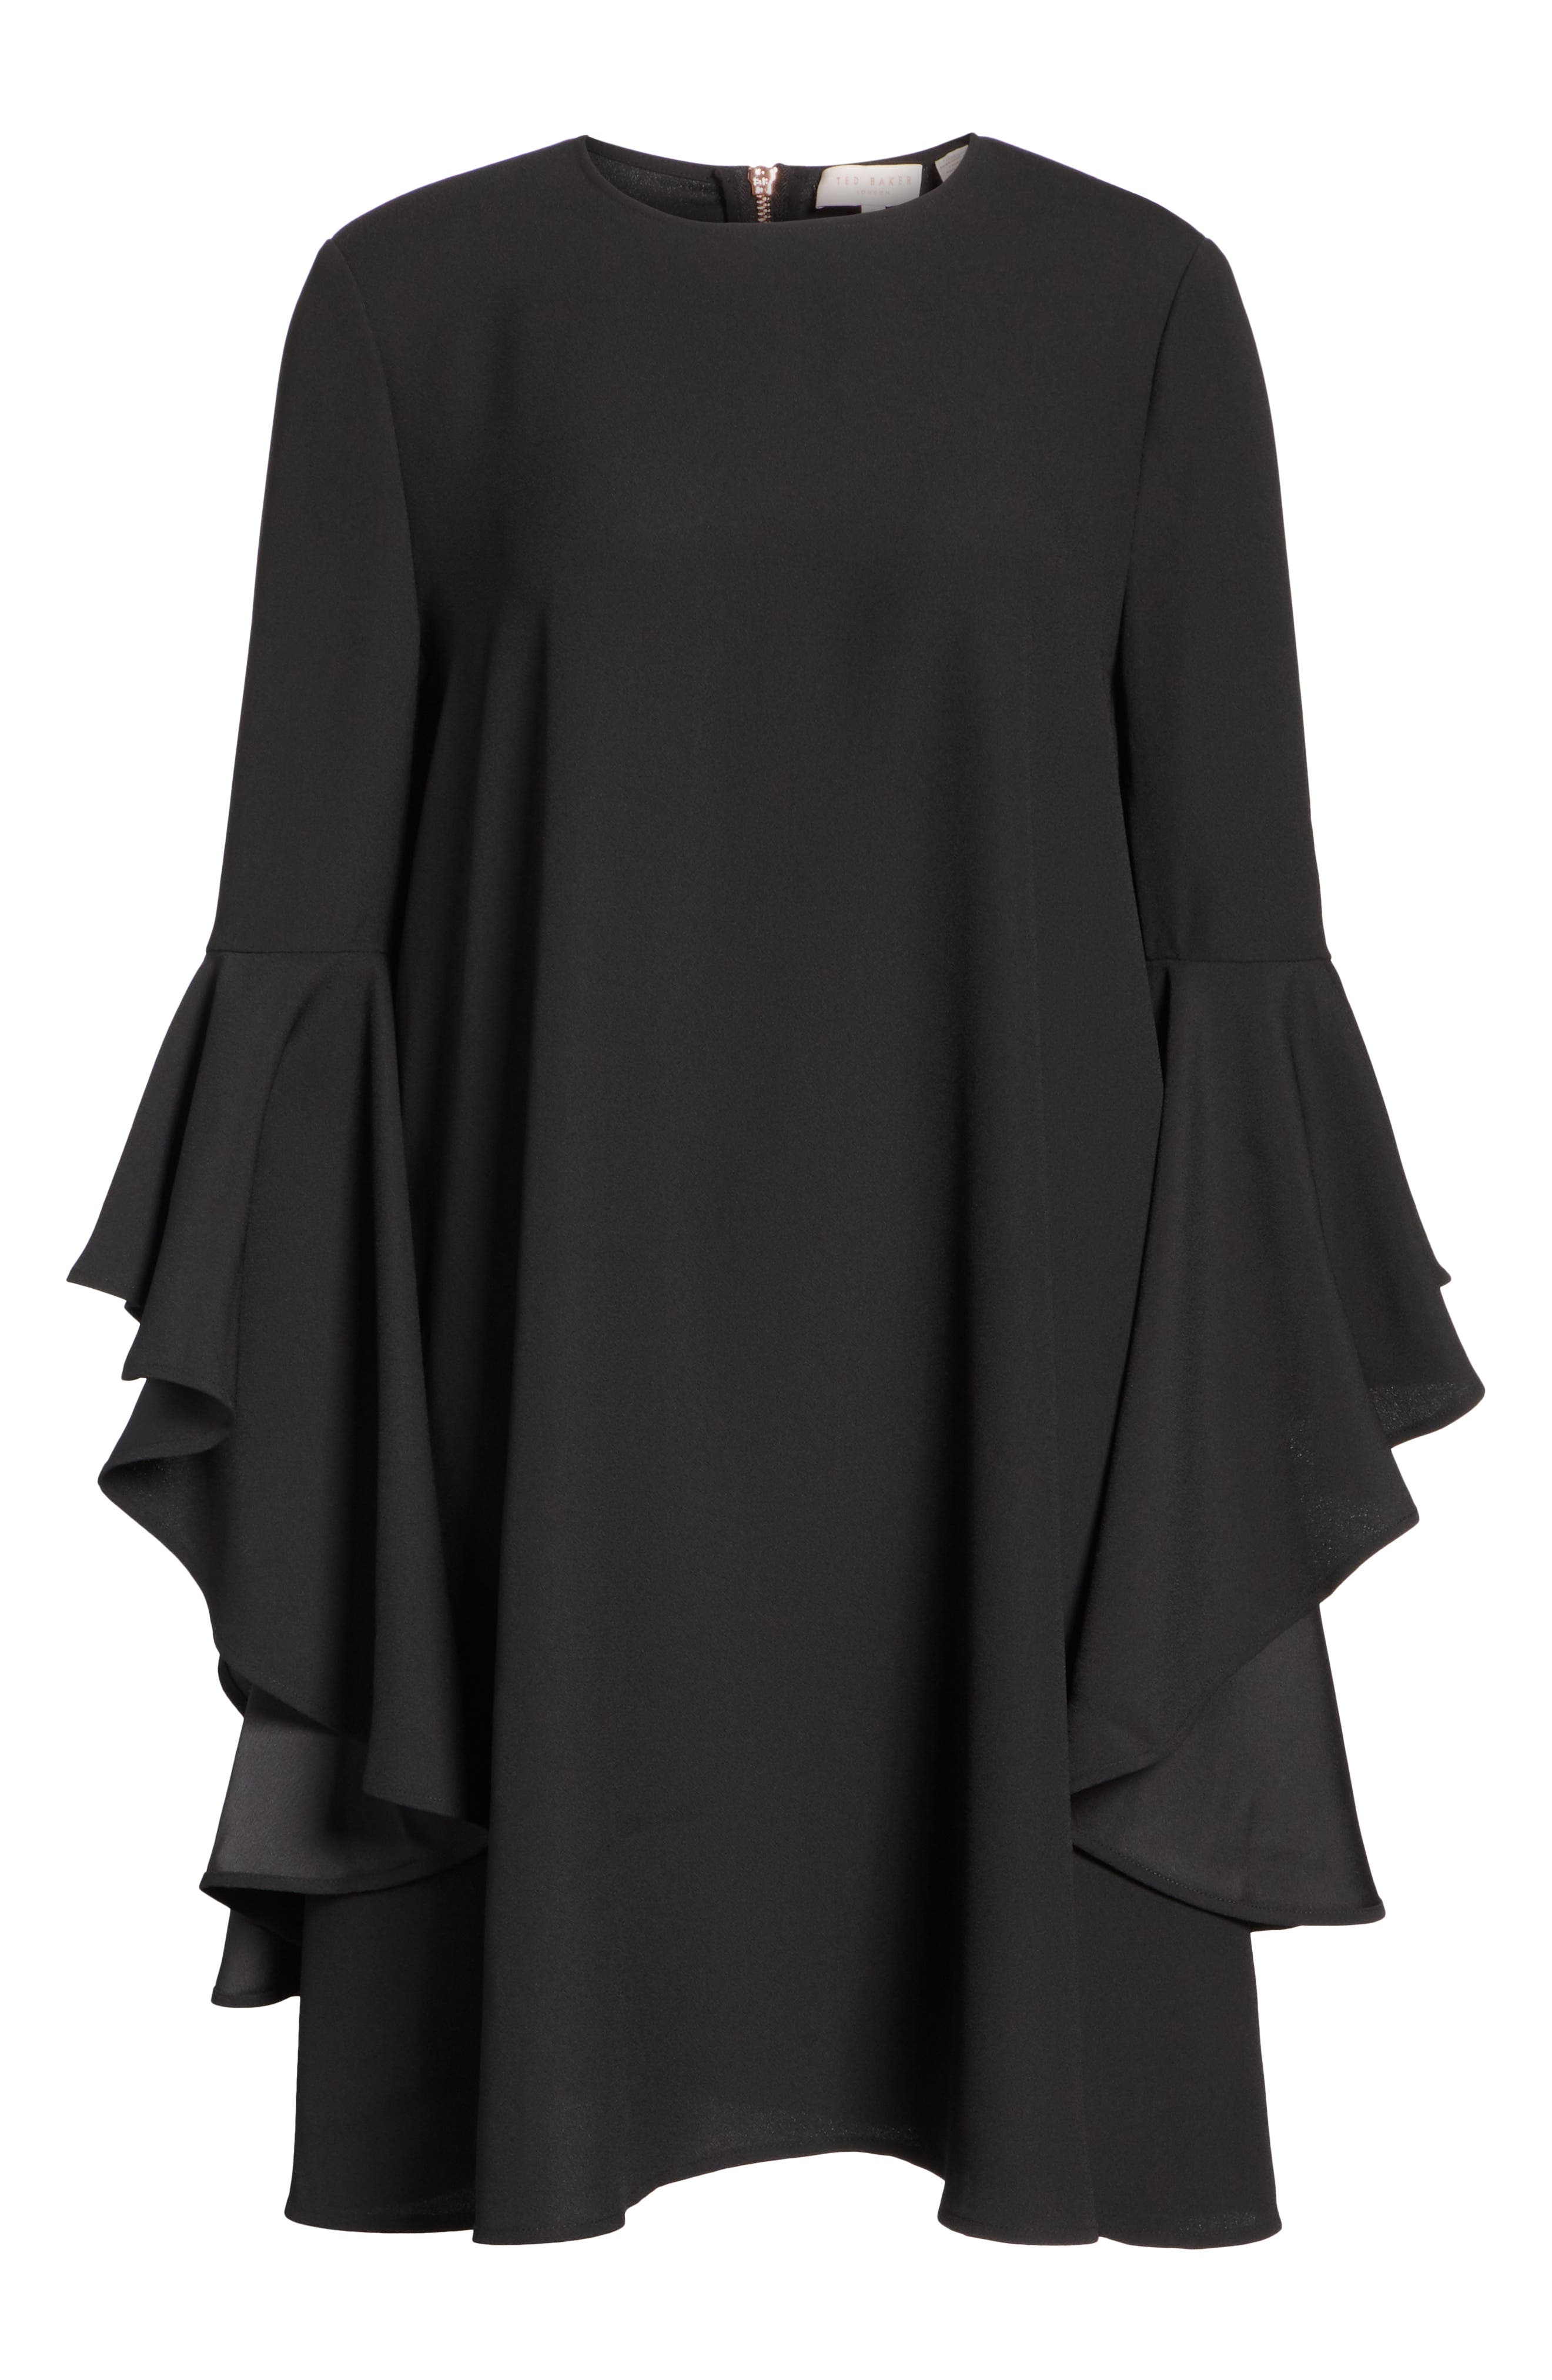 TED BAKER LONDON,                             Ashley Waterfall Sleeve A-Line Dress,                             Alternate thumbnail 6, color,                             001